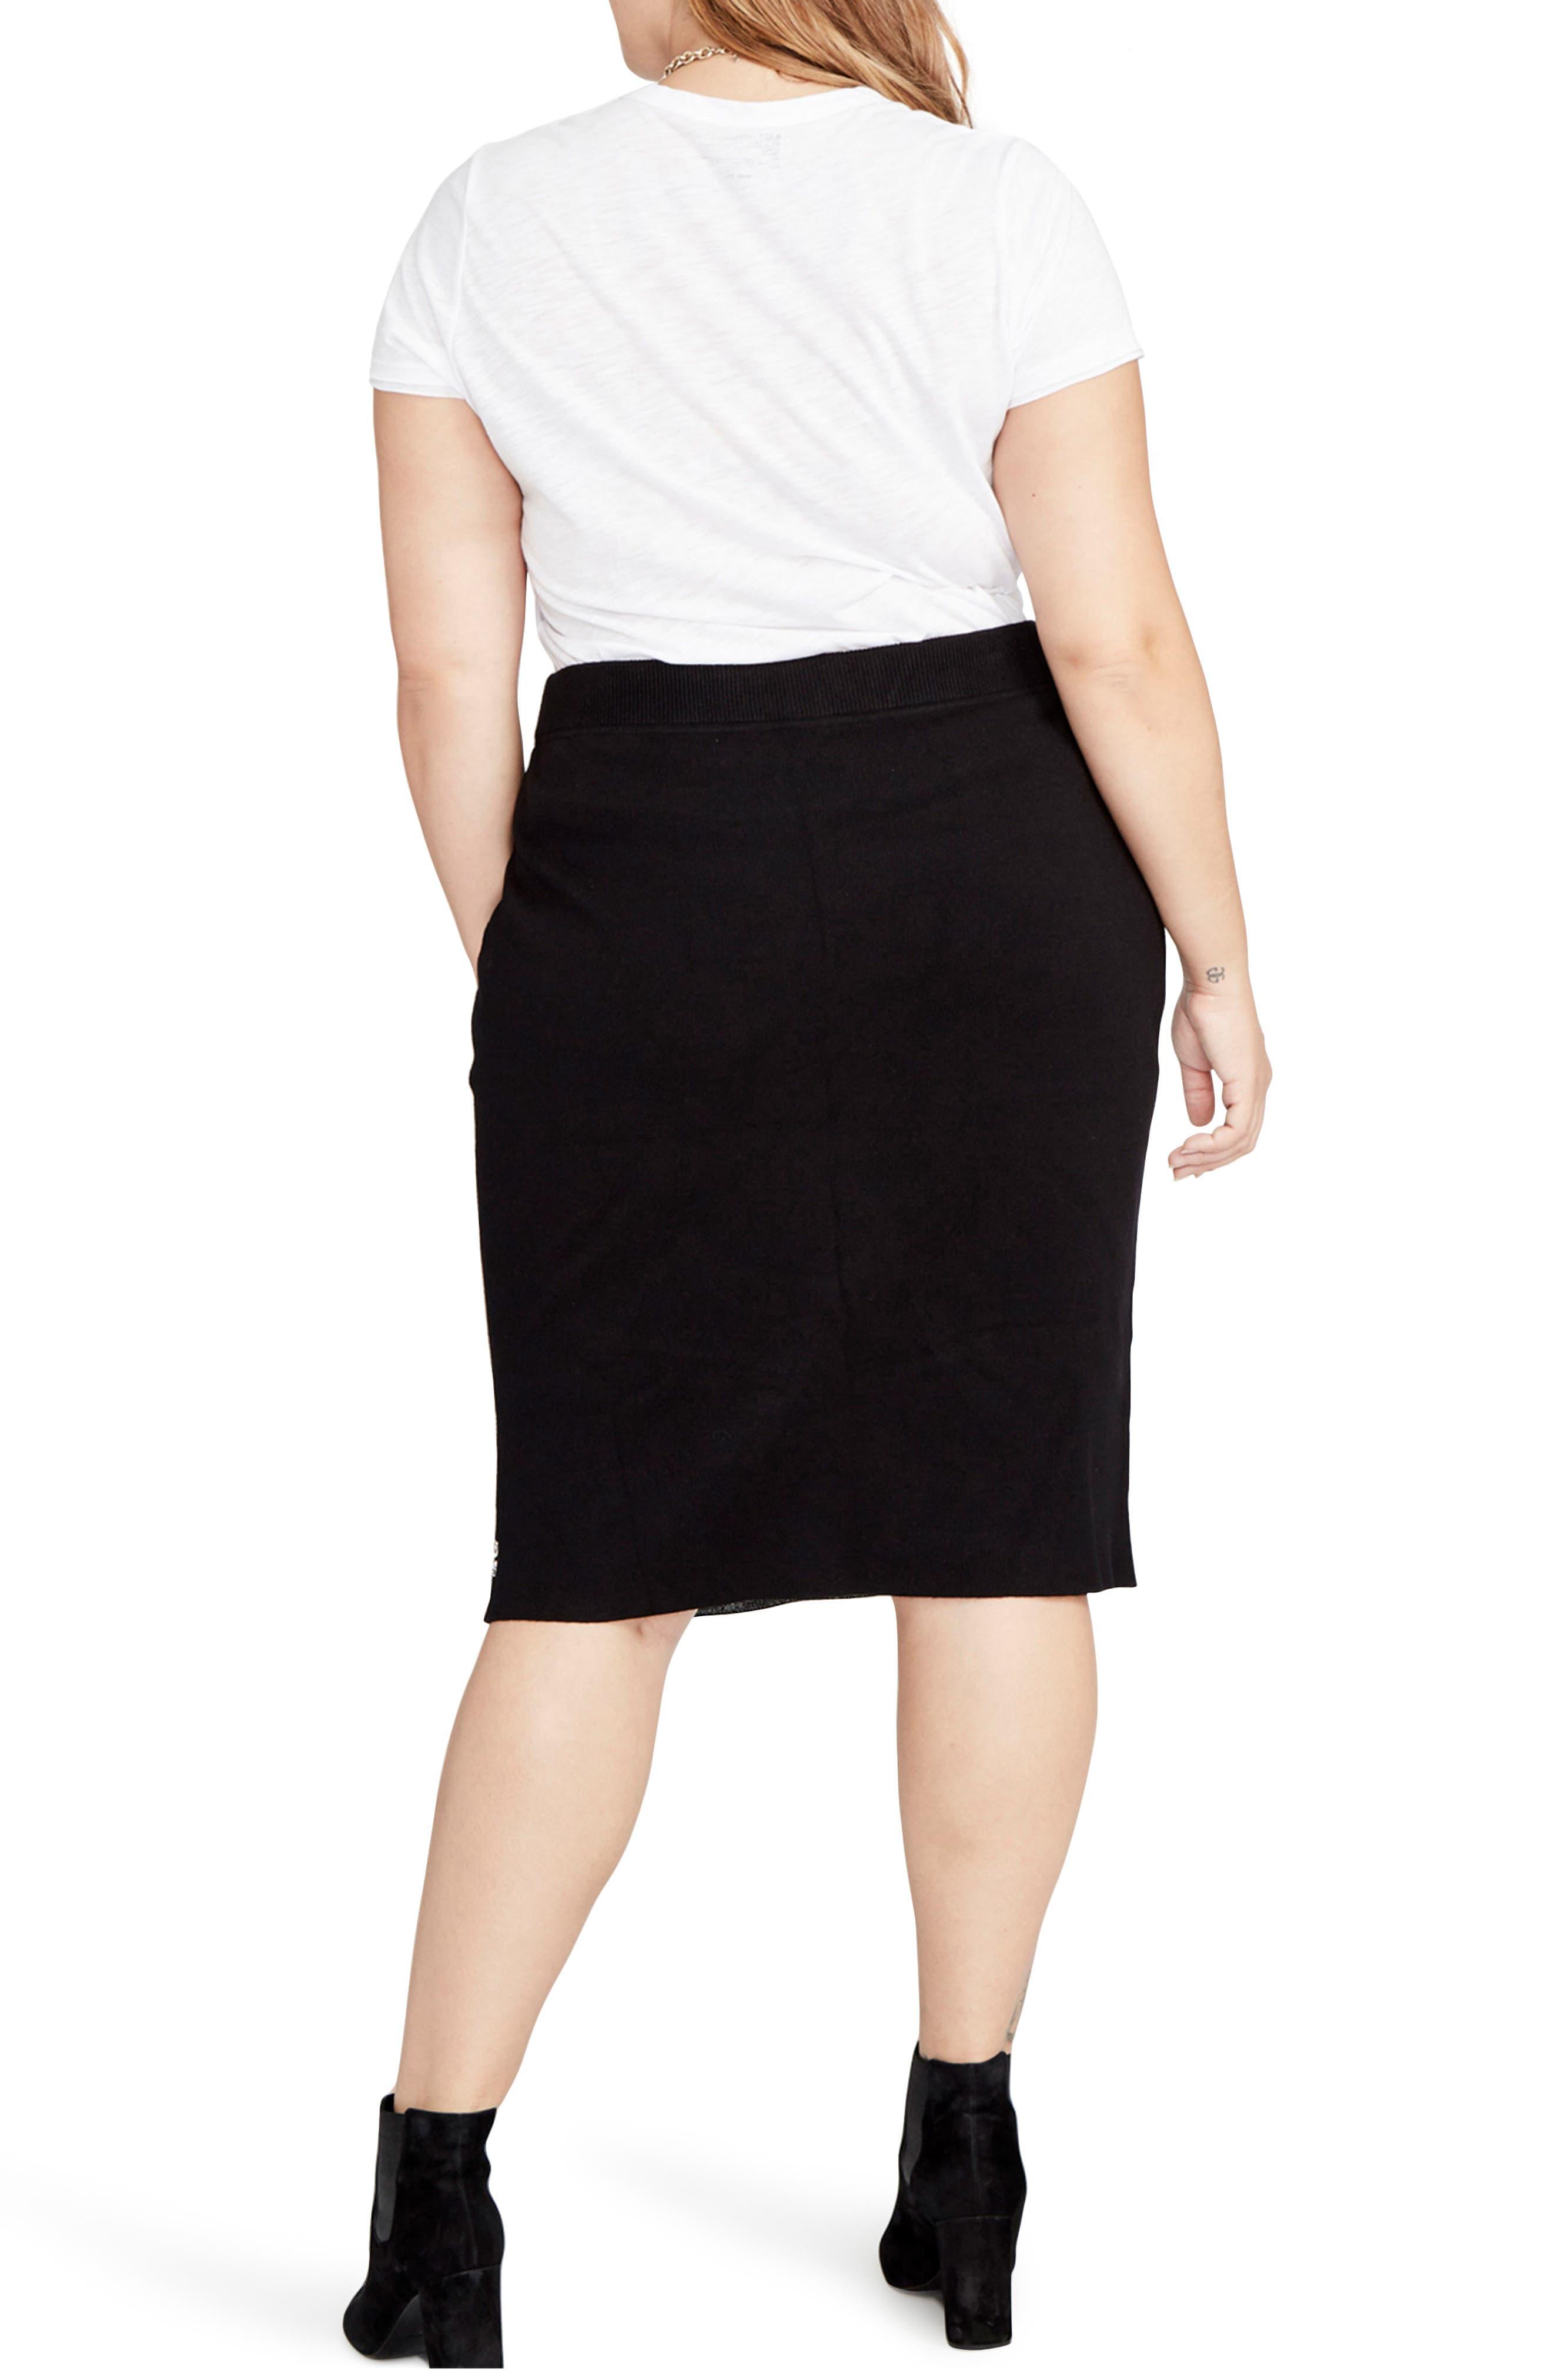 Paisley Knit Pencil Skirt,                             Alternate thumbnail 2, color,                             Black/ Natural